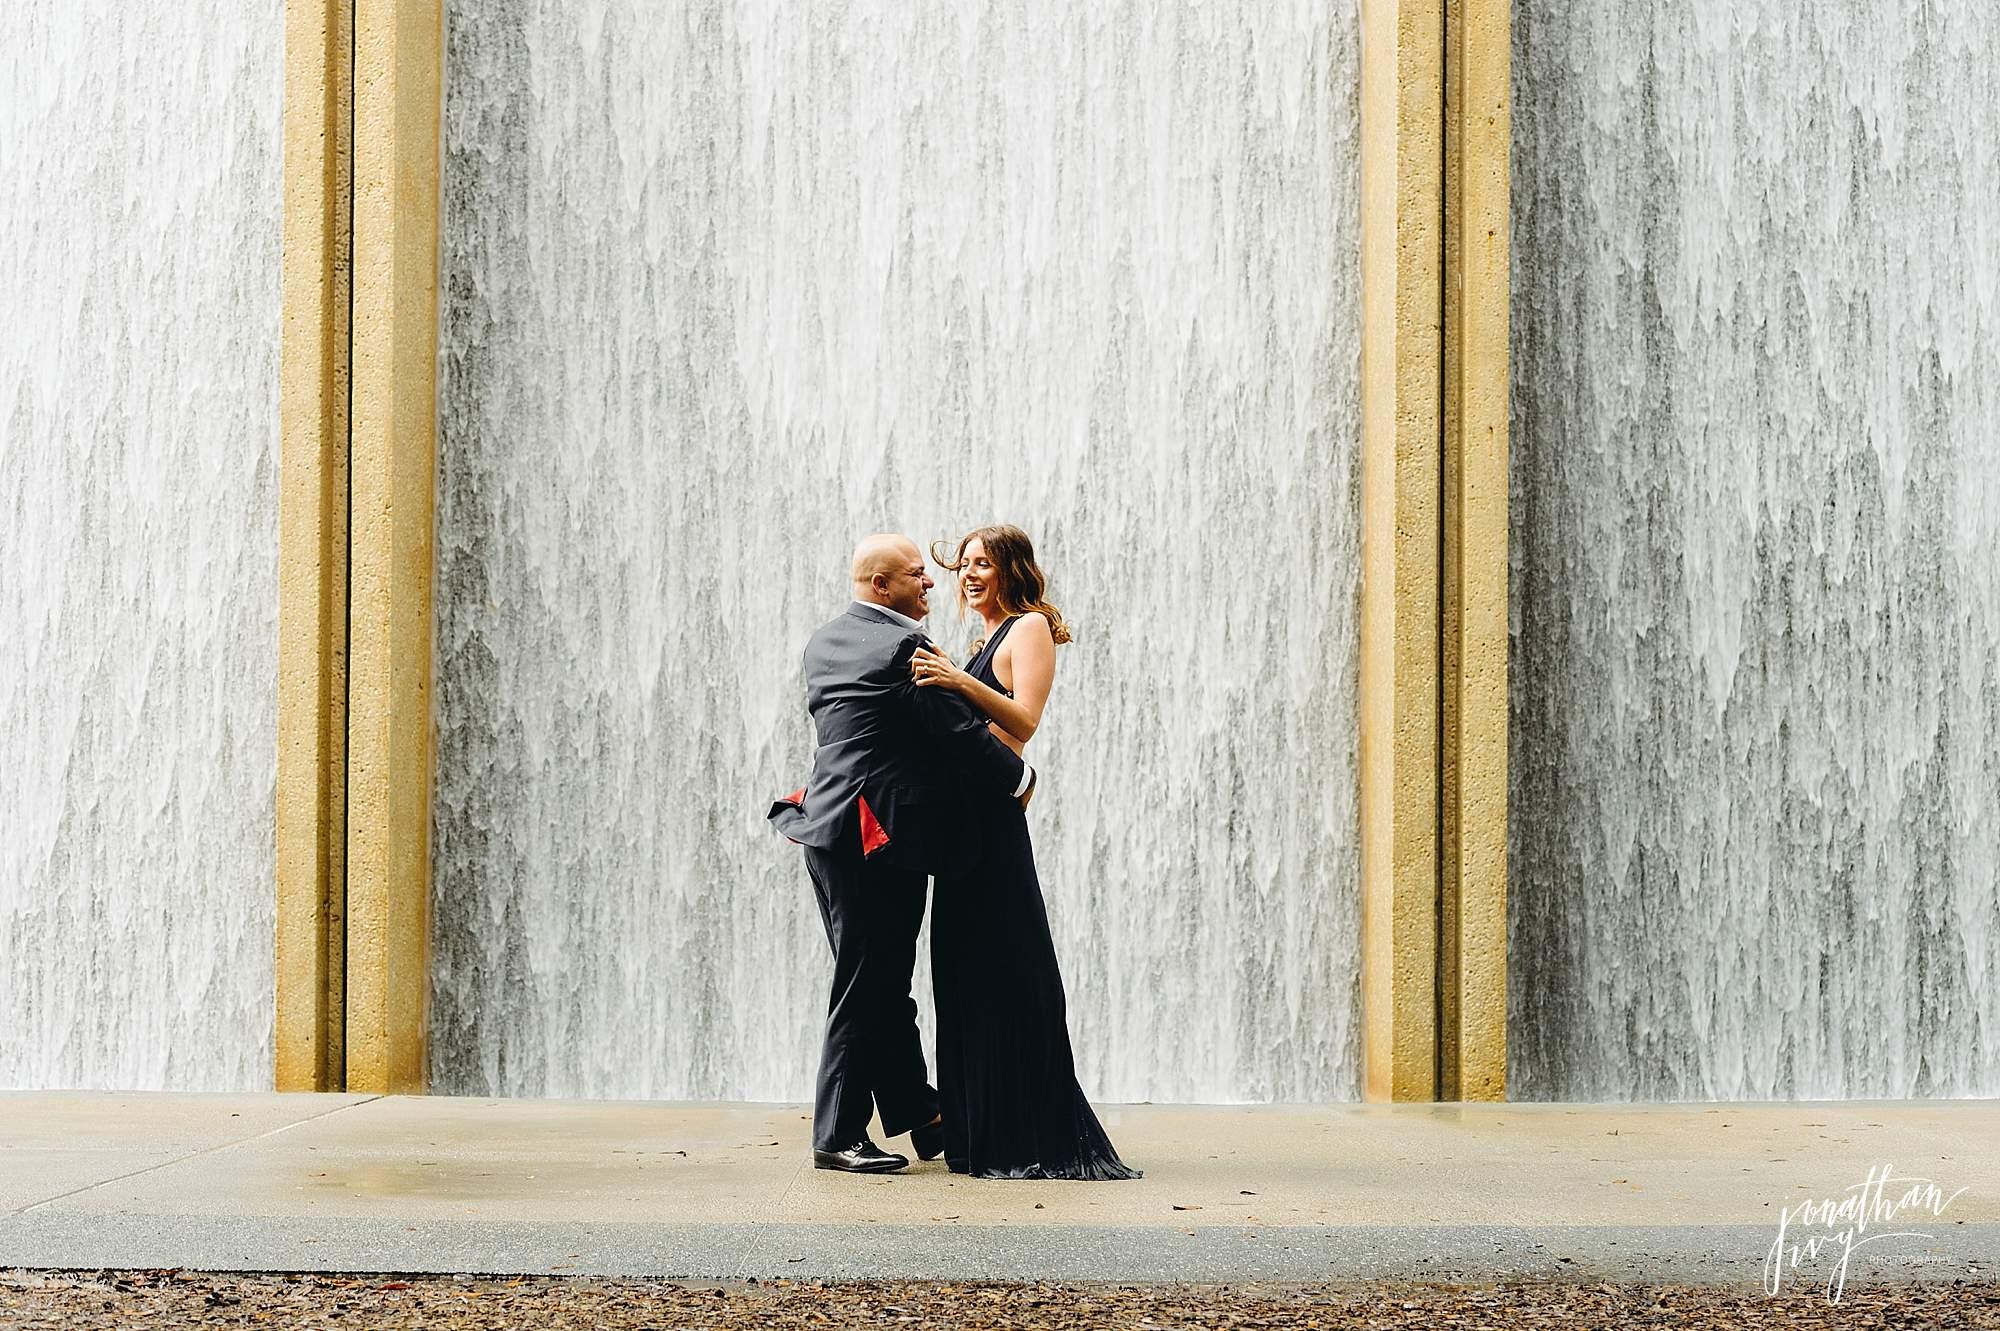 Romantic-Engagement-Photos-Houston_0003.jpg